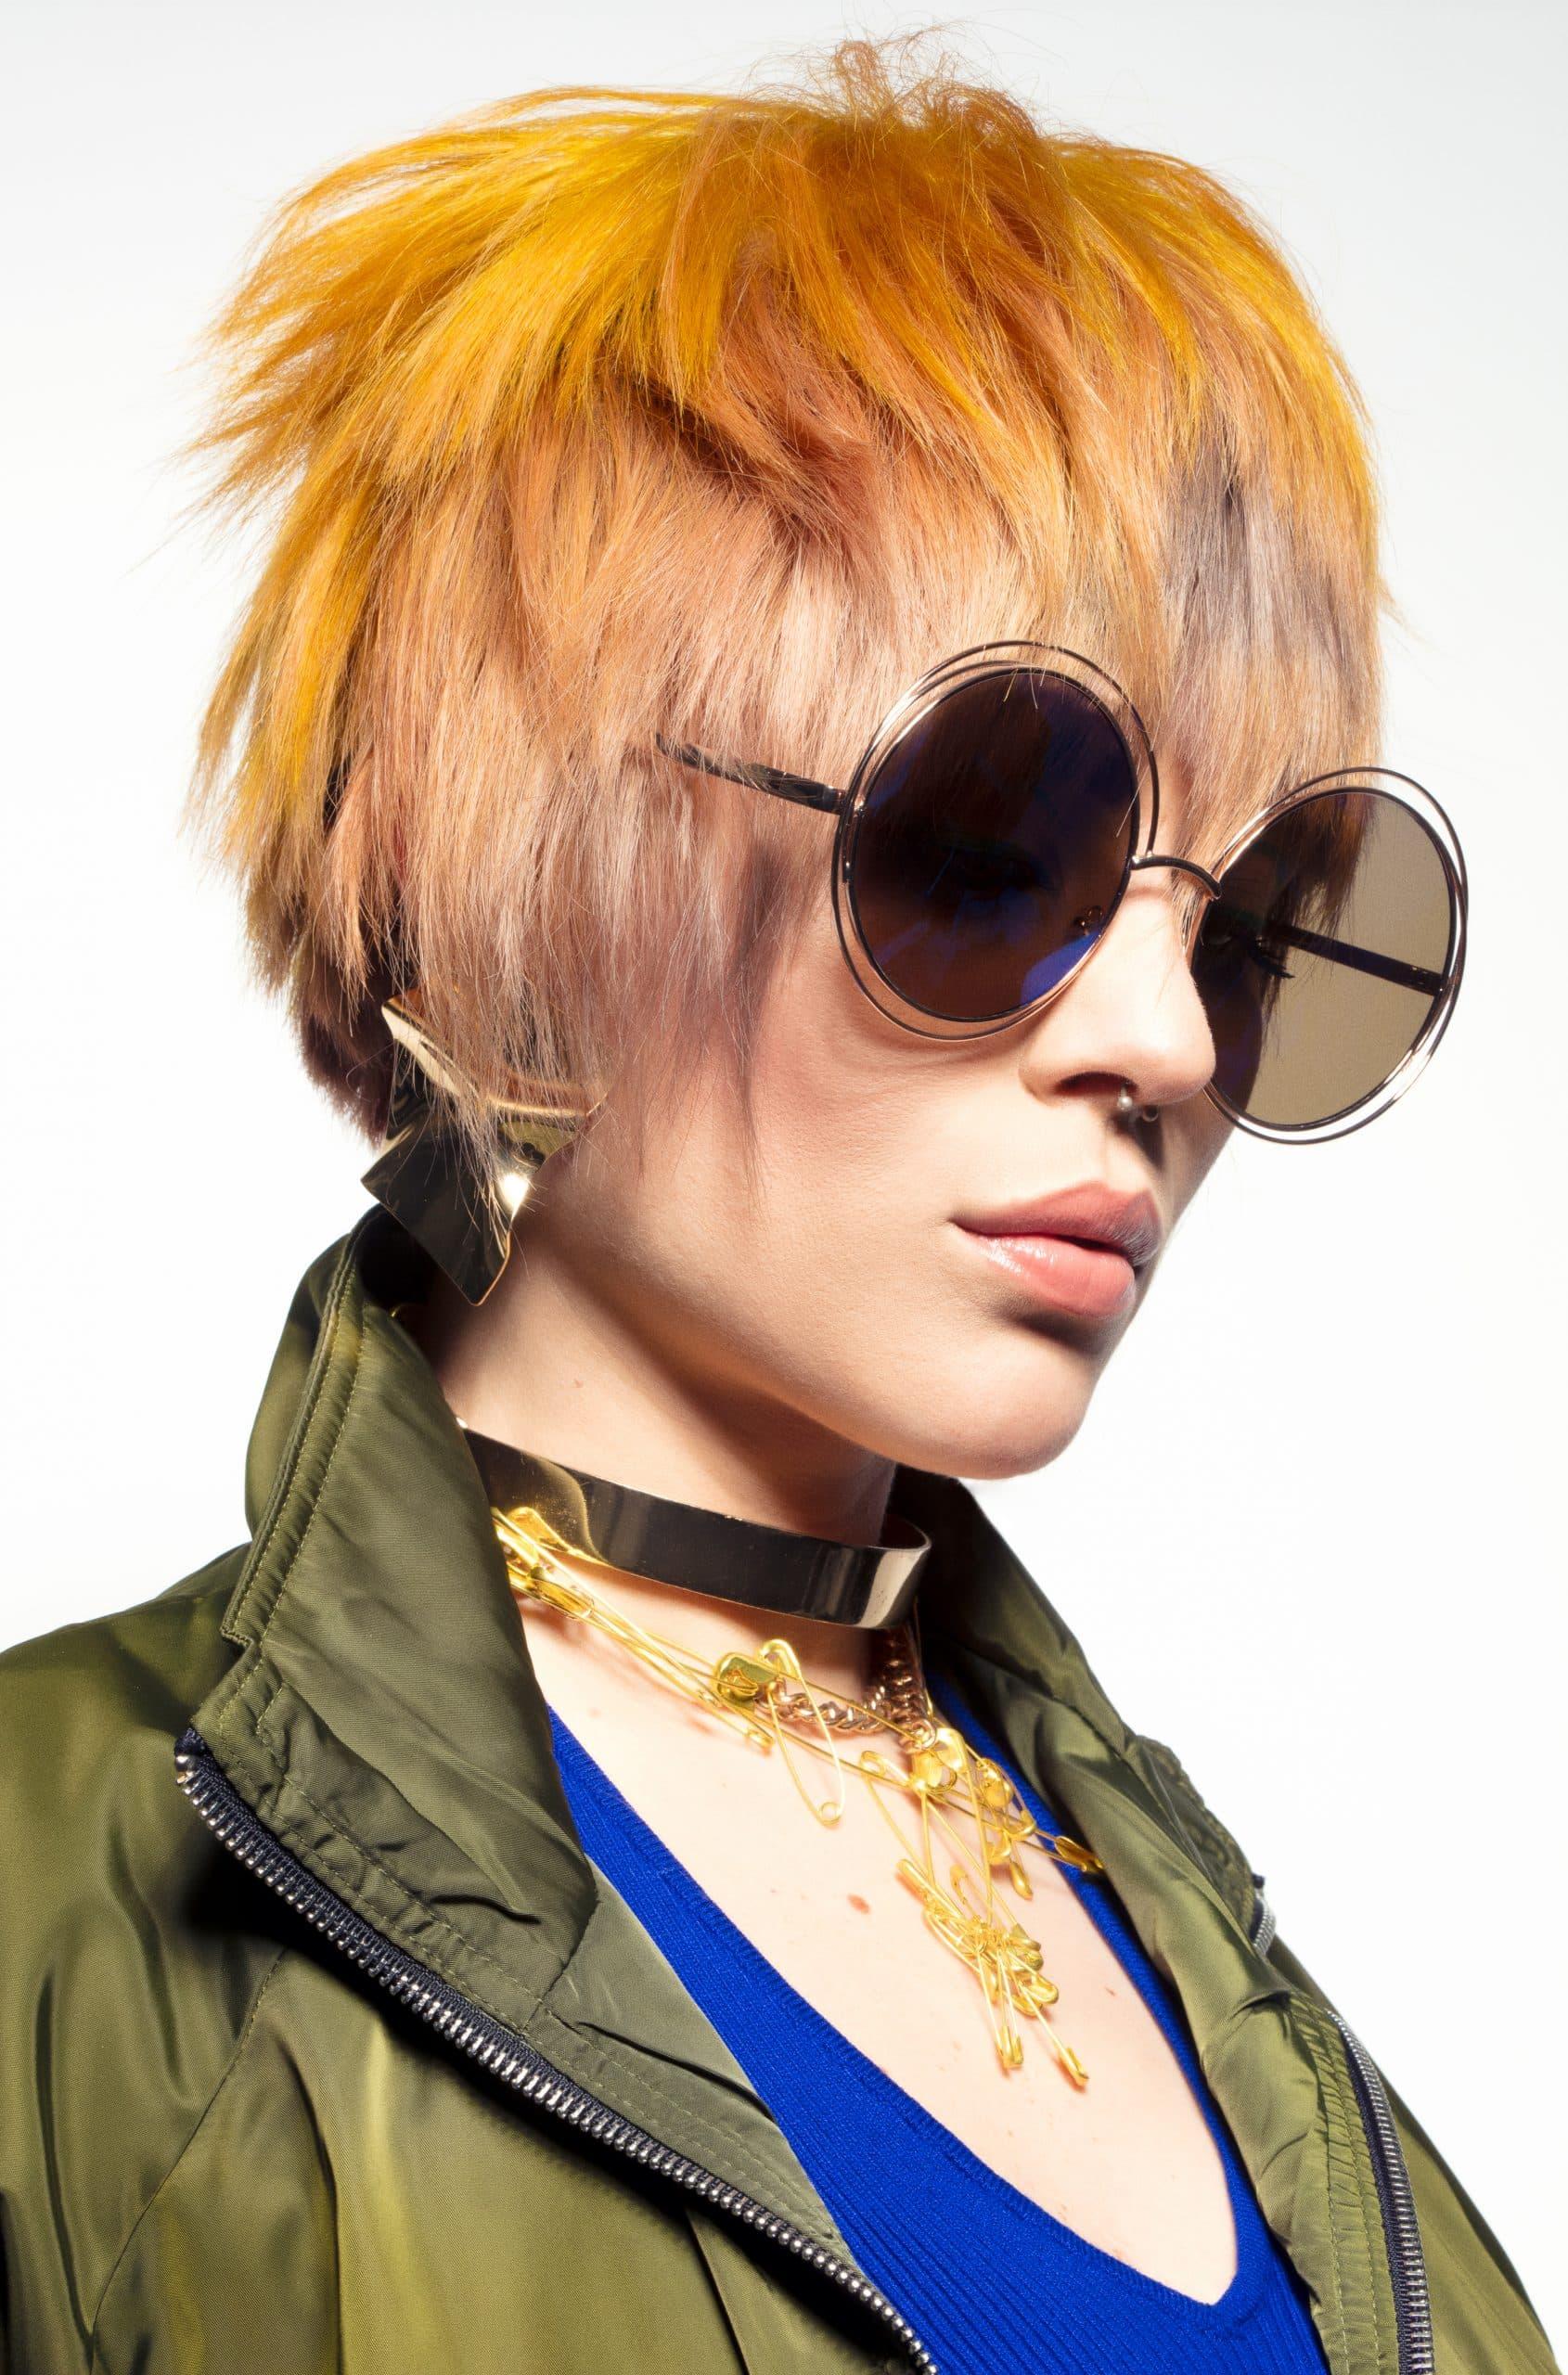 MyTreasure Urban @Hairkrone 4 1 scaled